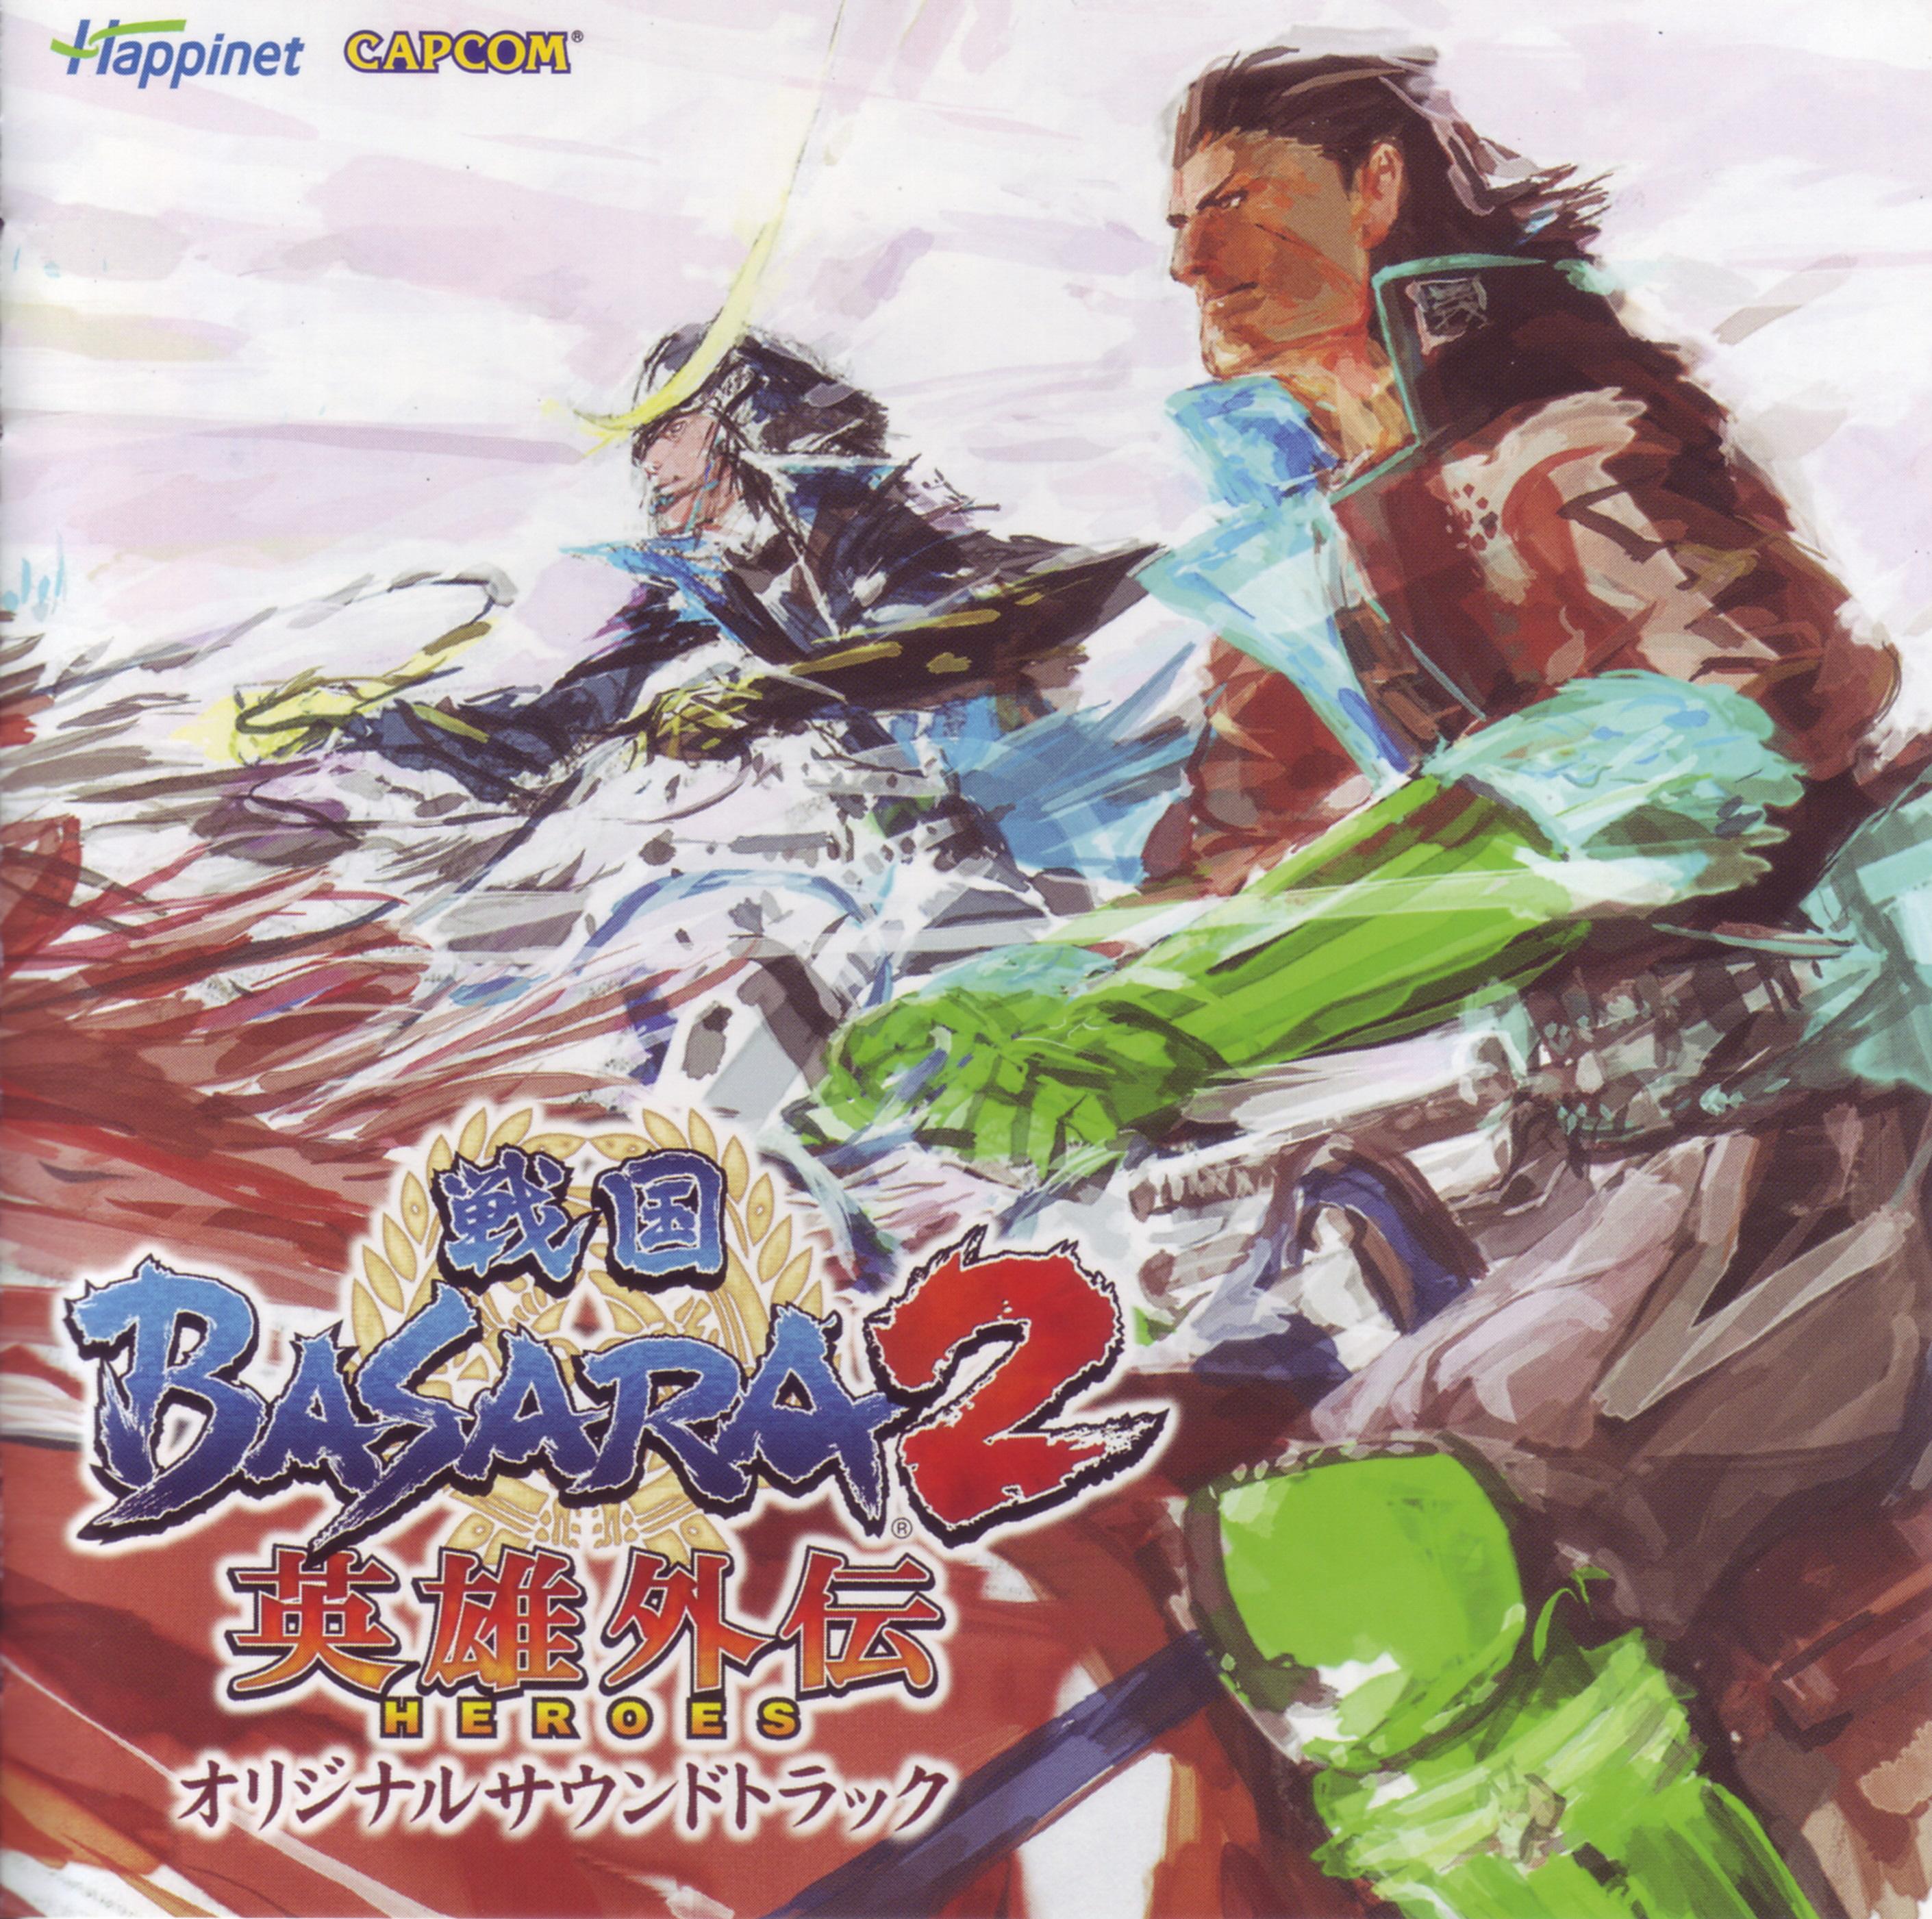 sengoku basara 2 heroes original soundtrack soundtrack from sengoku